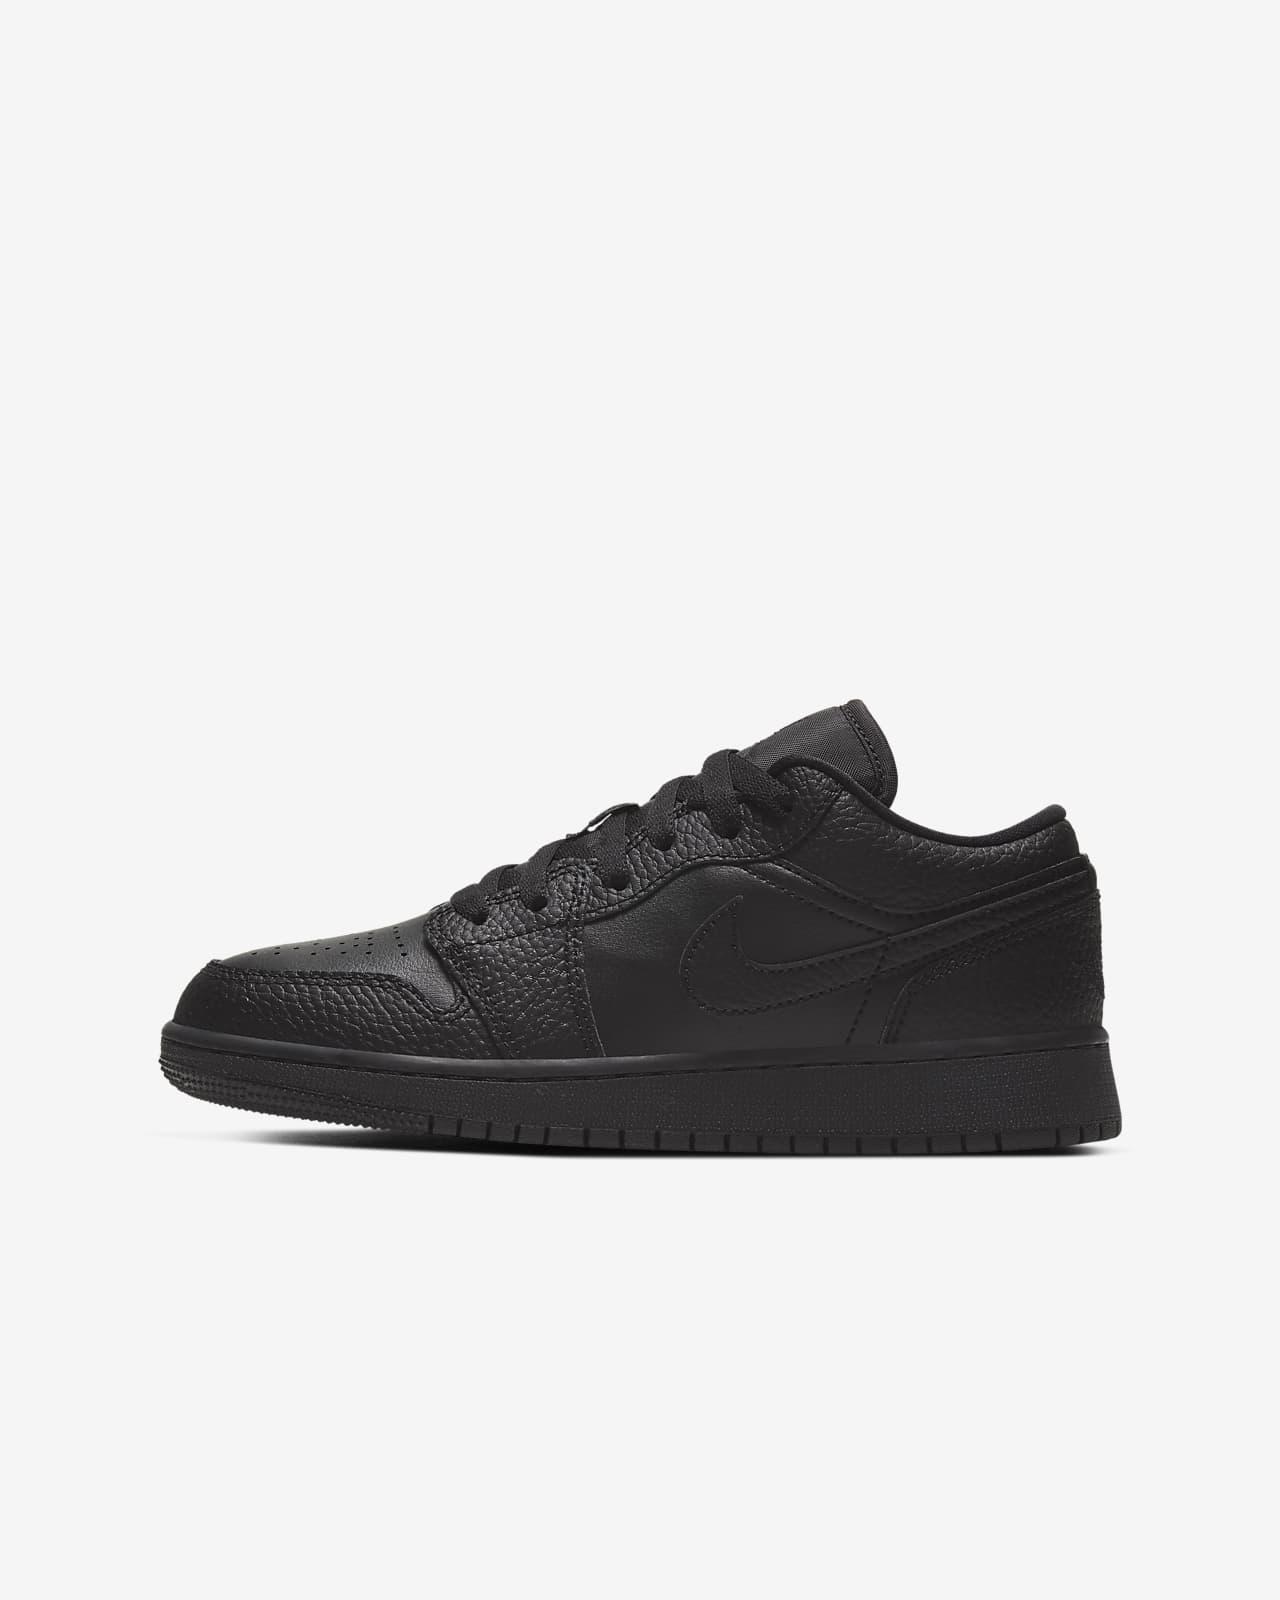 Air Jordan 1 Low Schuh für ältere Kinder